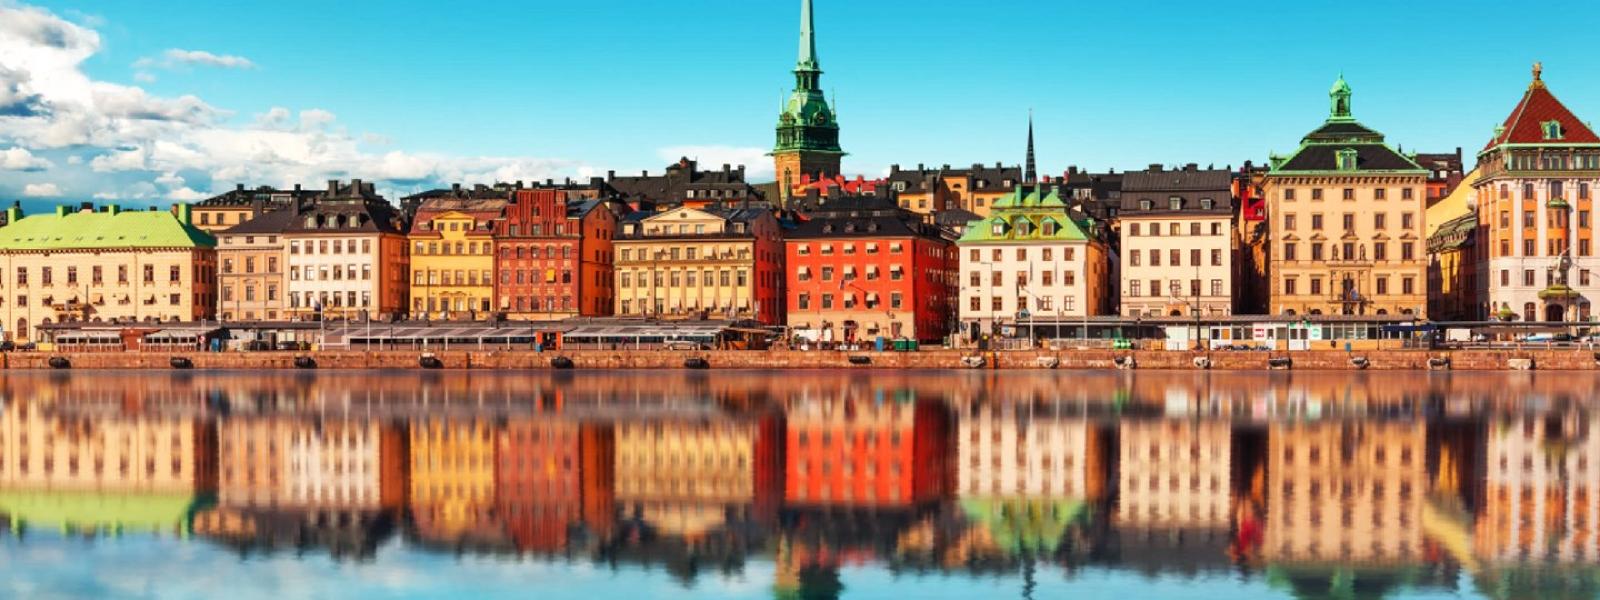 18/9 - Stockholmsweekend